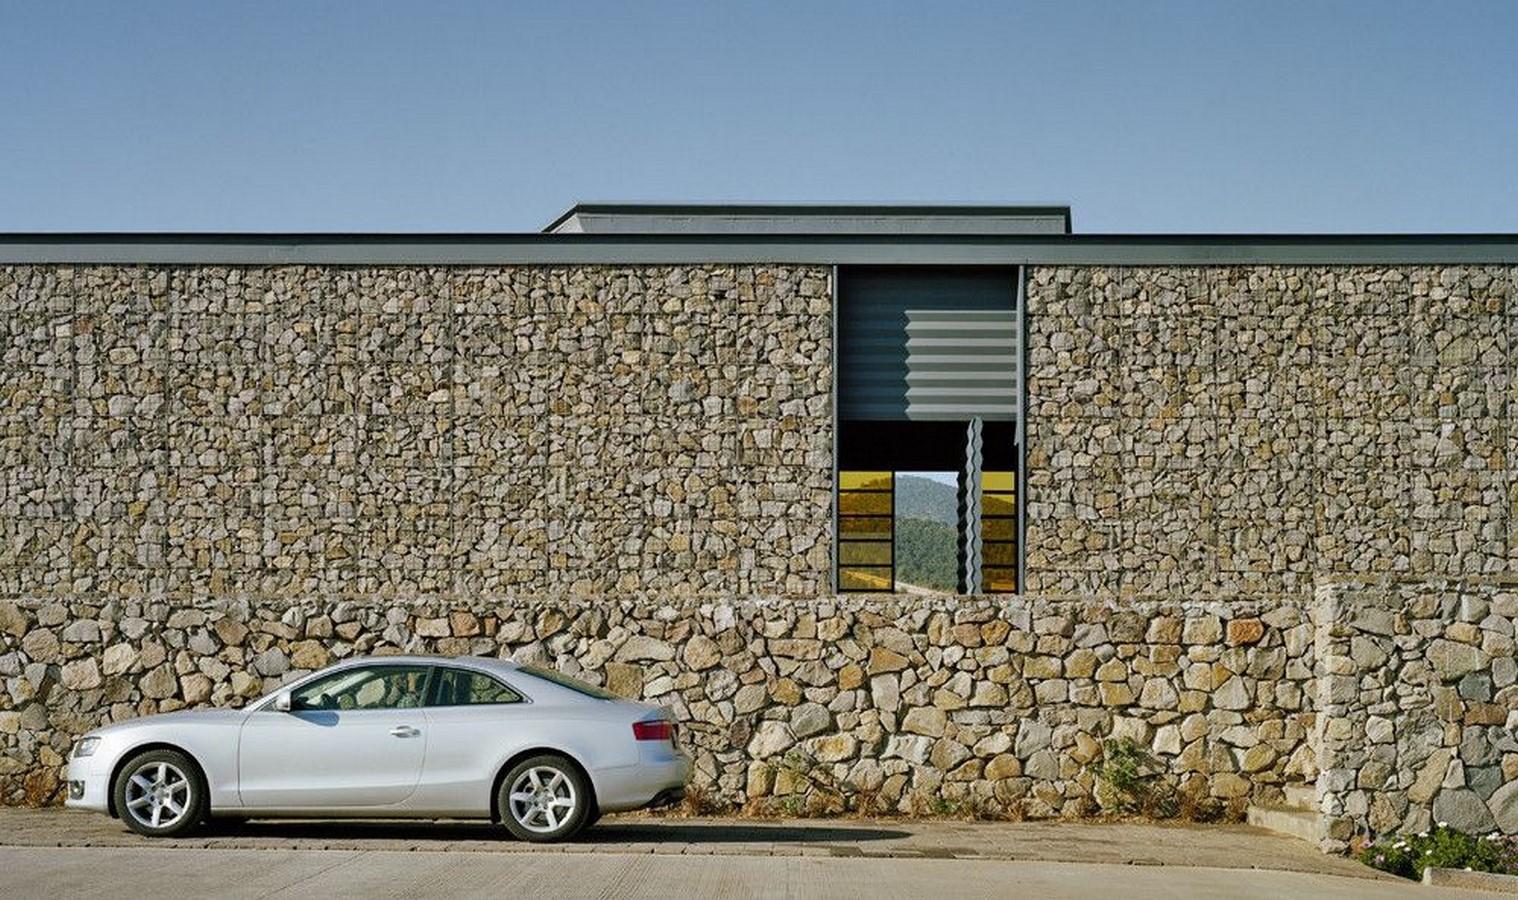 Gabion wall as a building technique - Sheet6